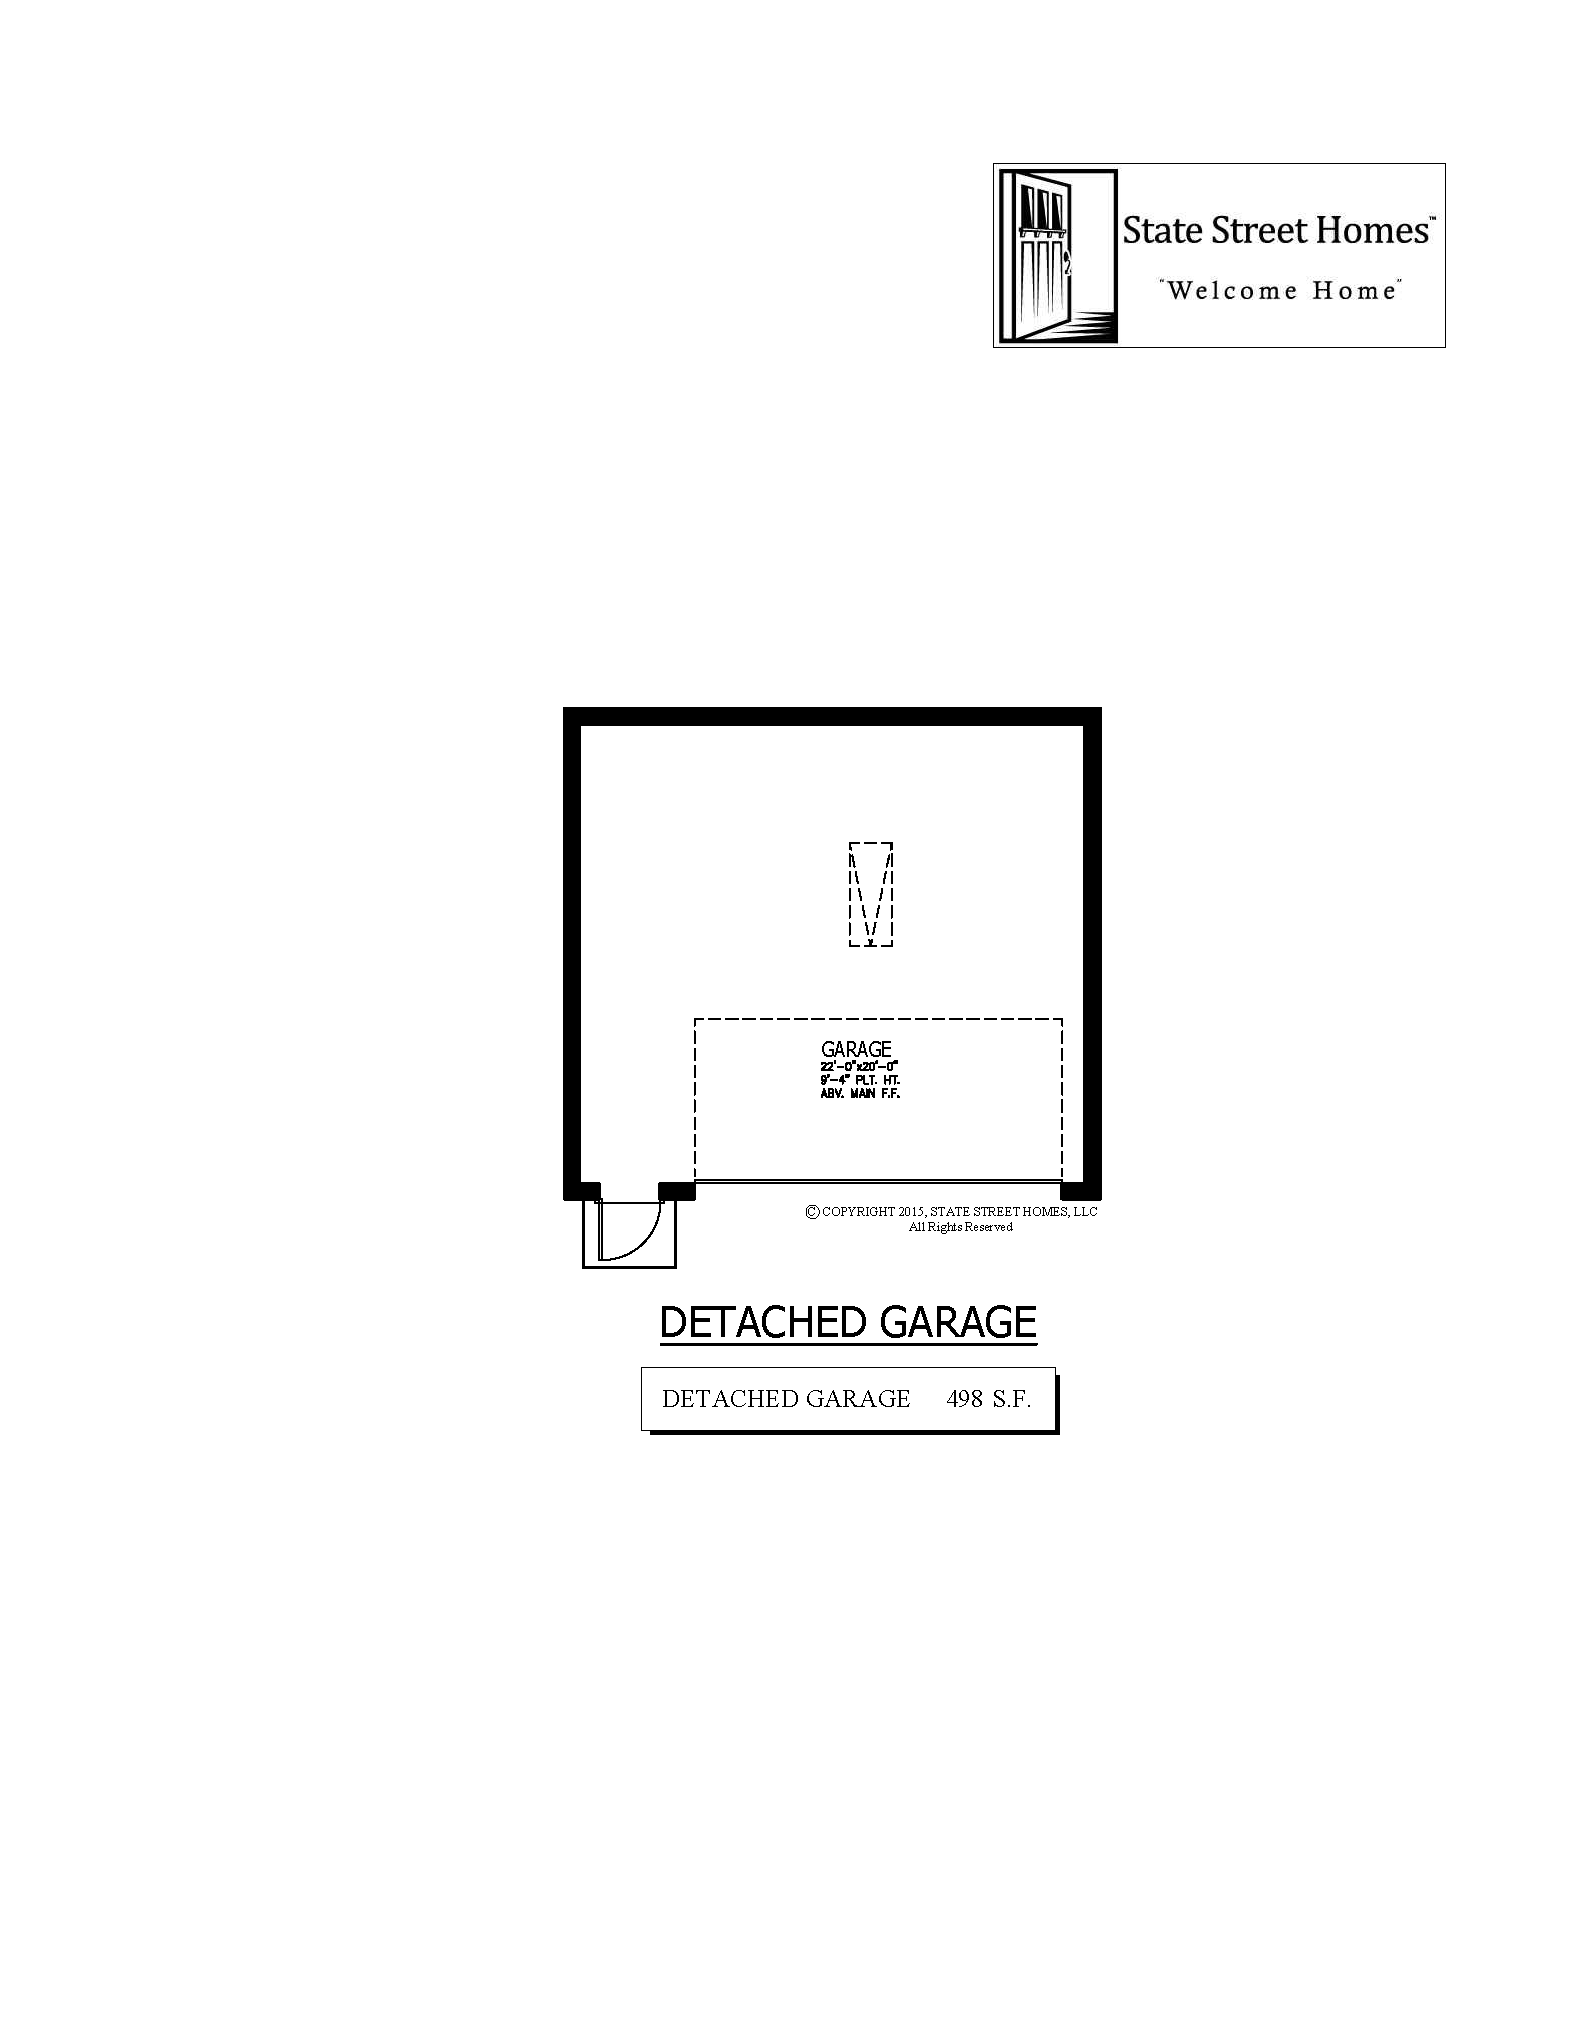 Home Design App How To Make A Second Floor 608 Clarendon Street Oldsmar State Street Homes